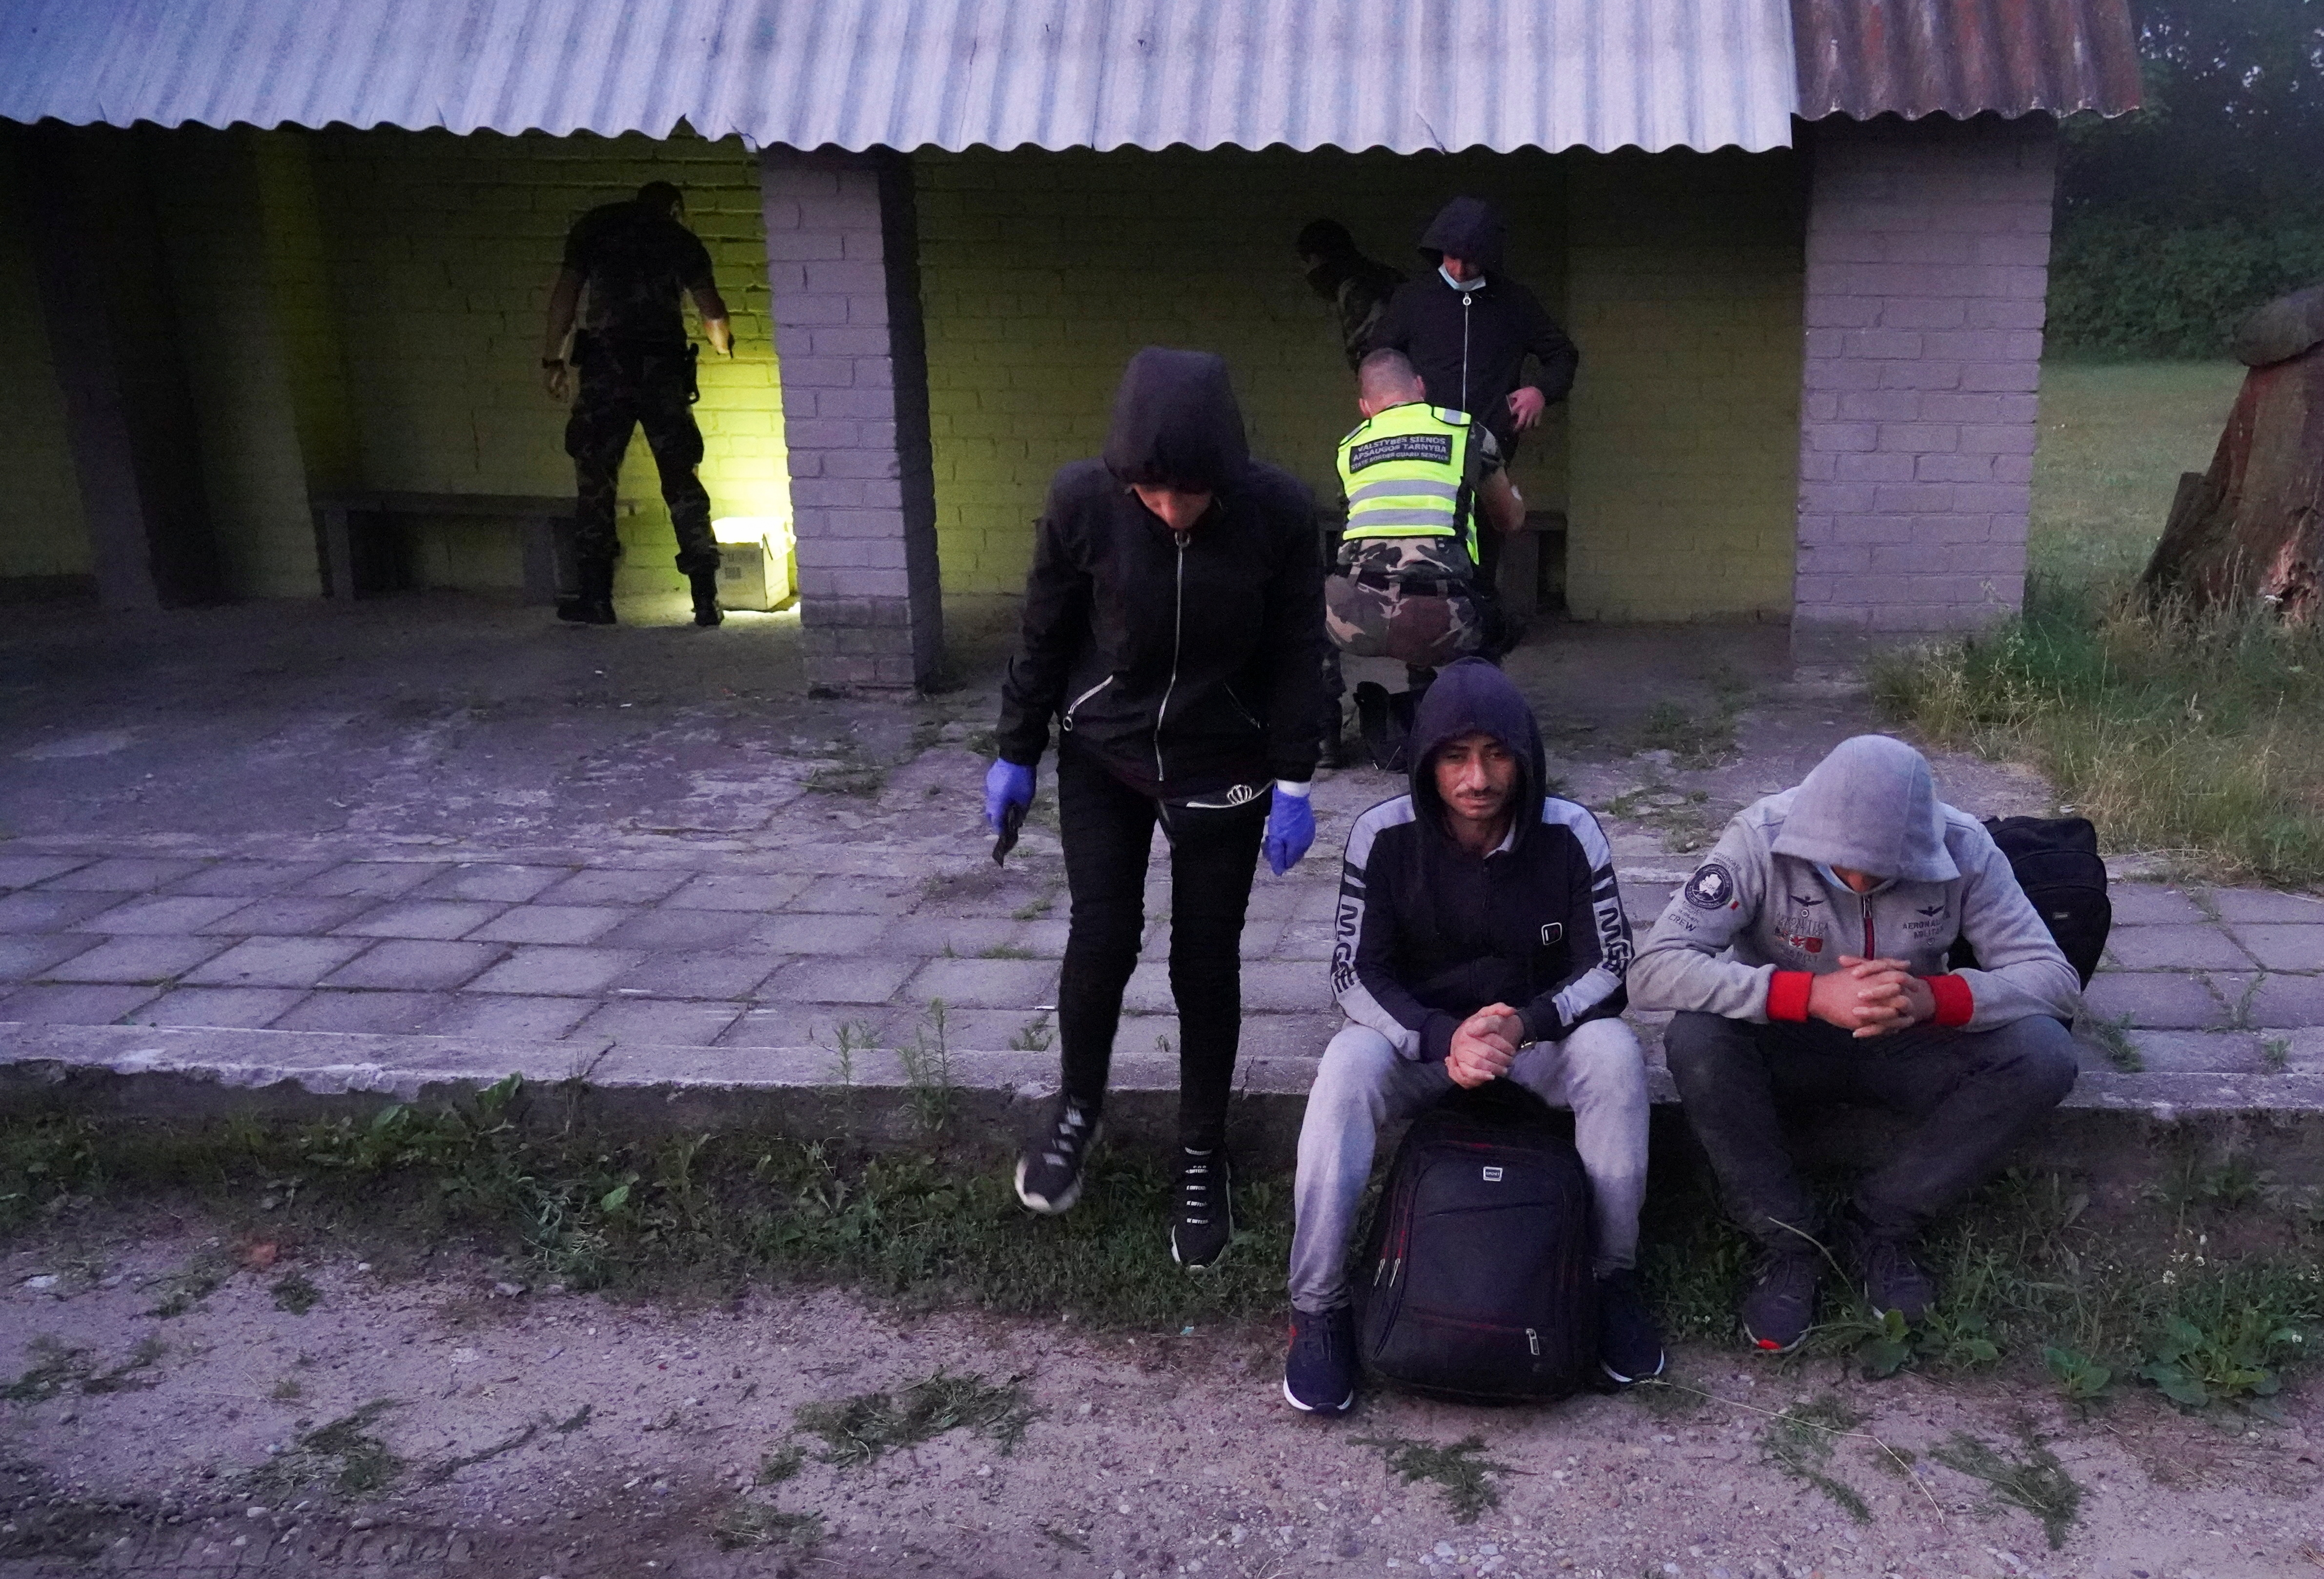 Lithuanian border guards detain migrants on Lithuania-Belarus border in Kalviai, Lithuania, July 7, 2021. REUTERS/Janis Laizans